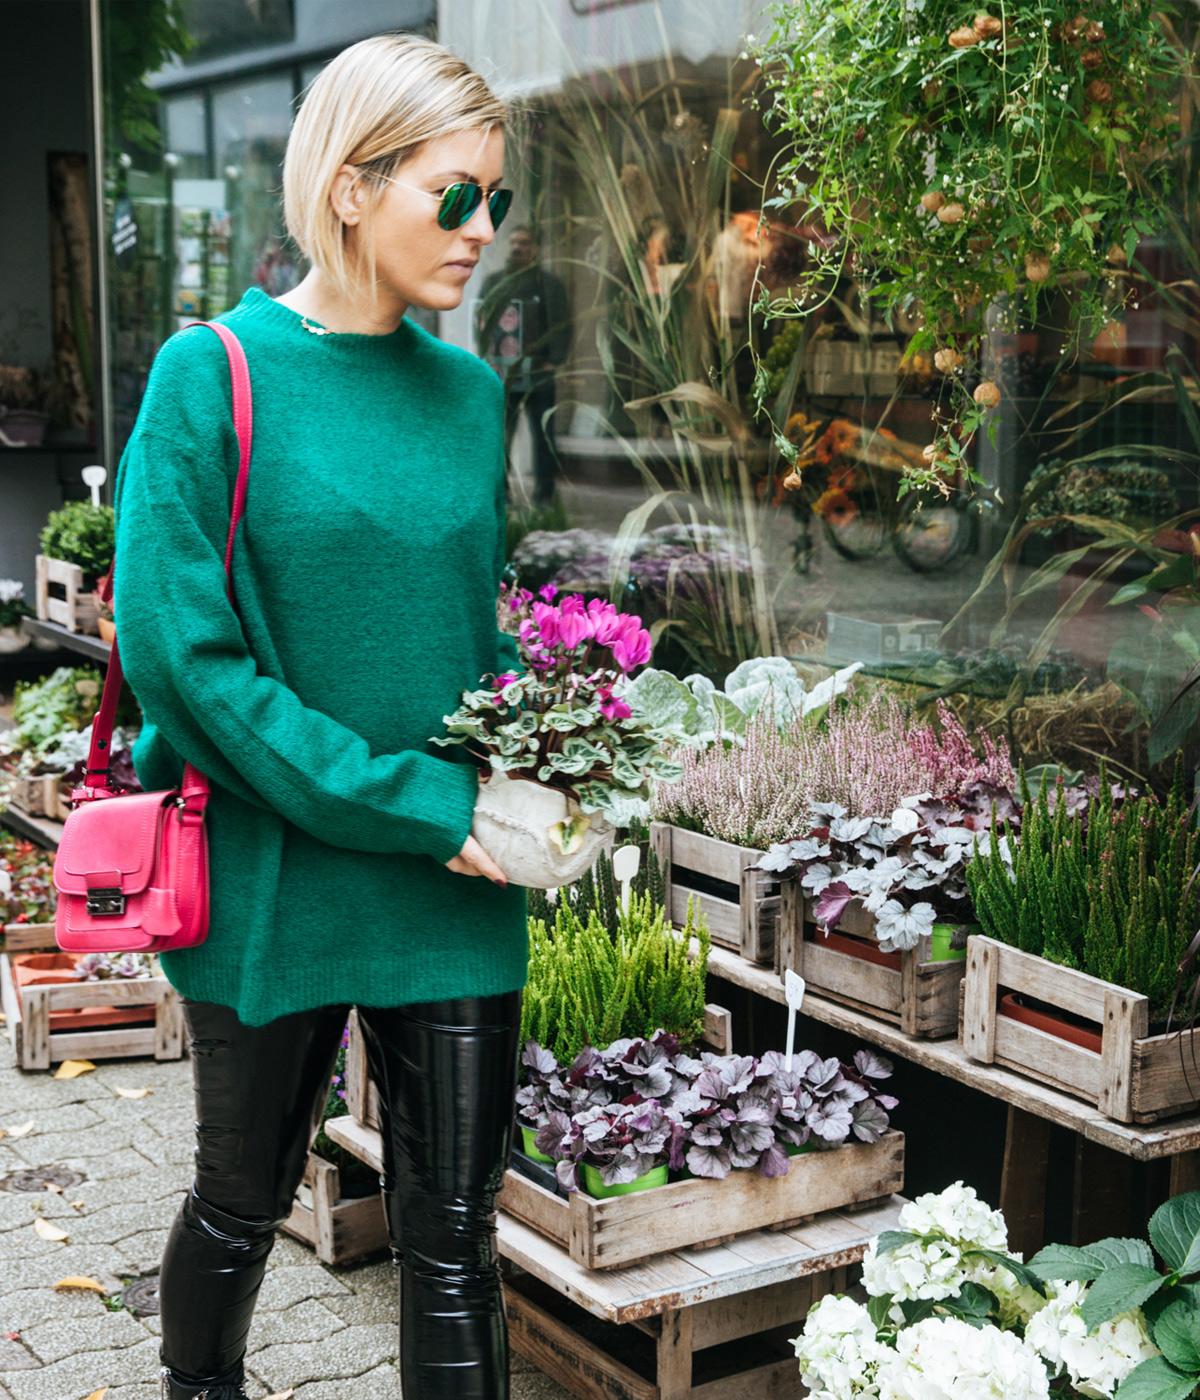 susanka-strick-pullover-pulli-stiefel-handtasche-pink-lederhose_3